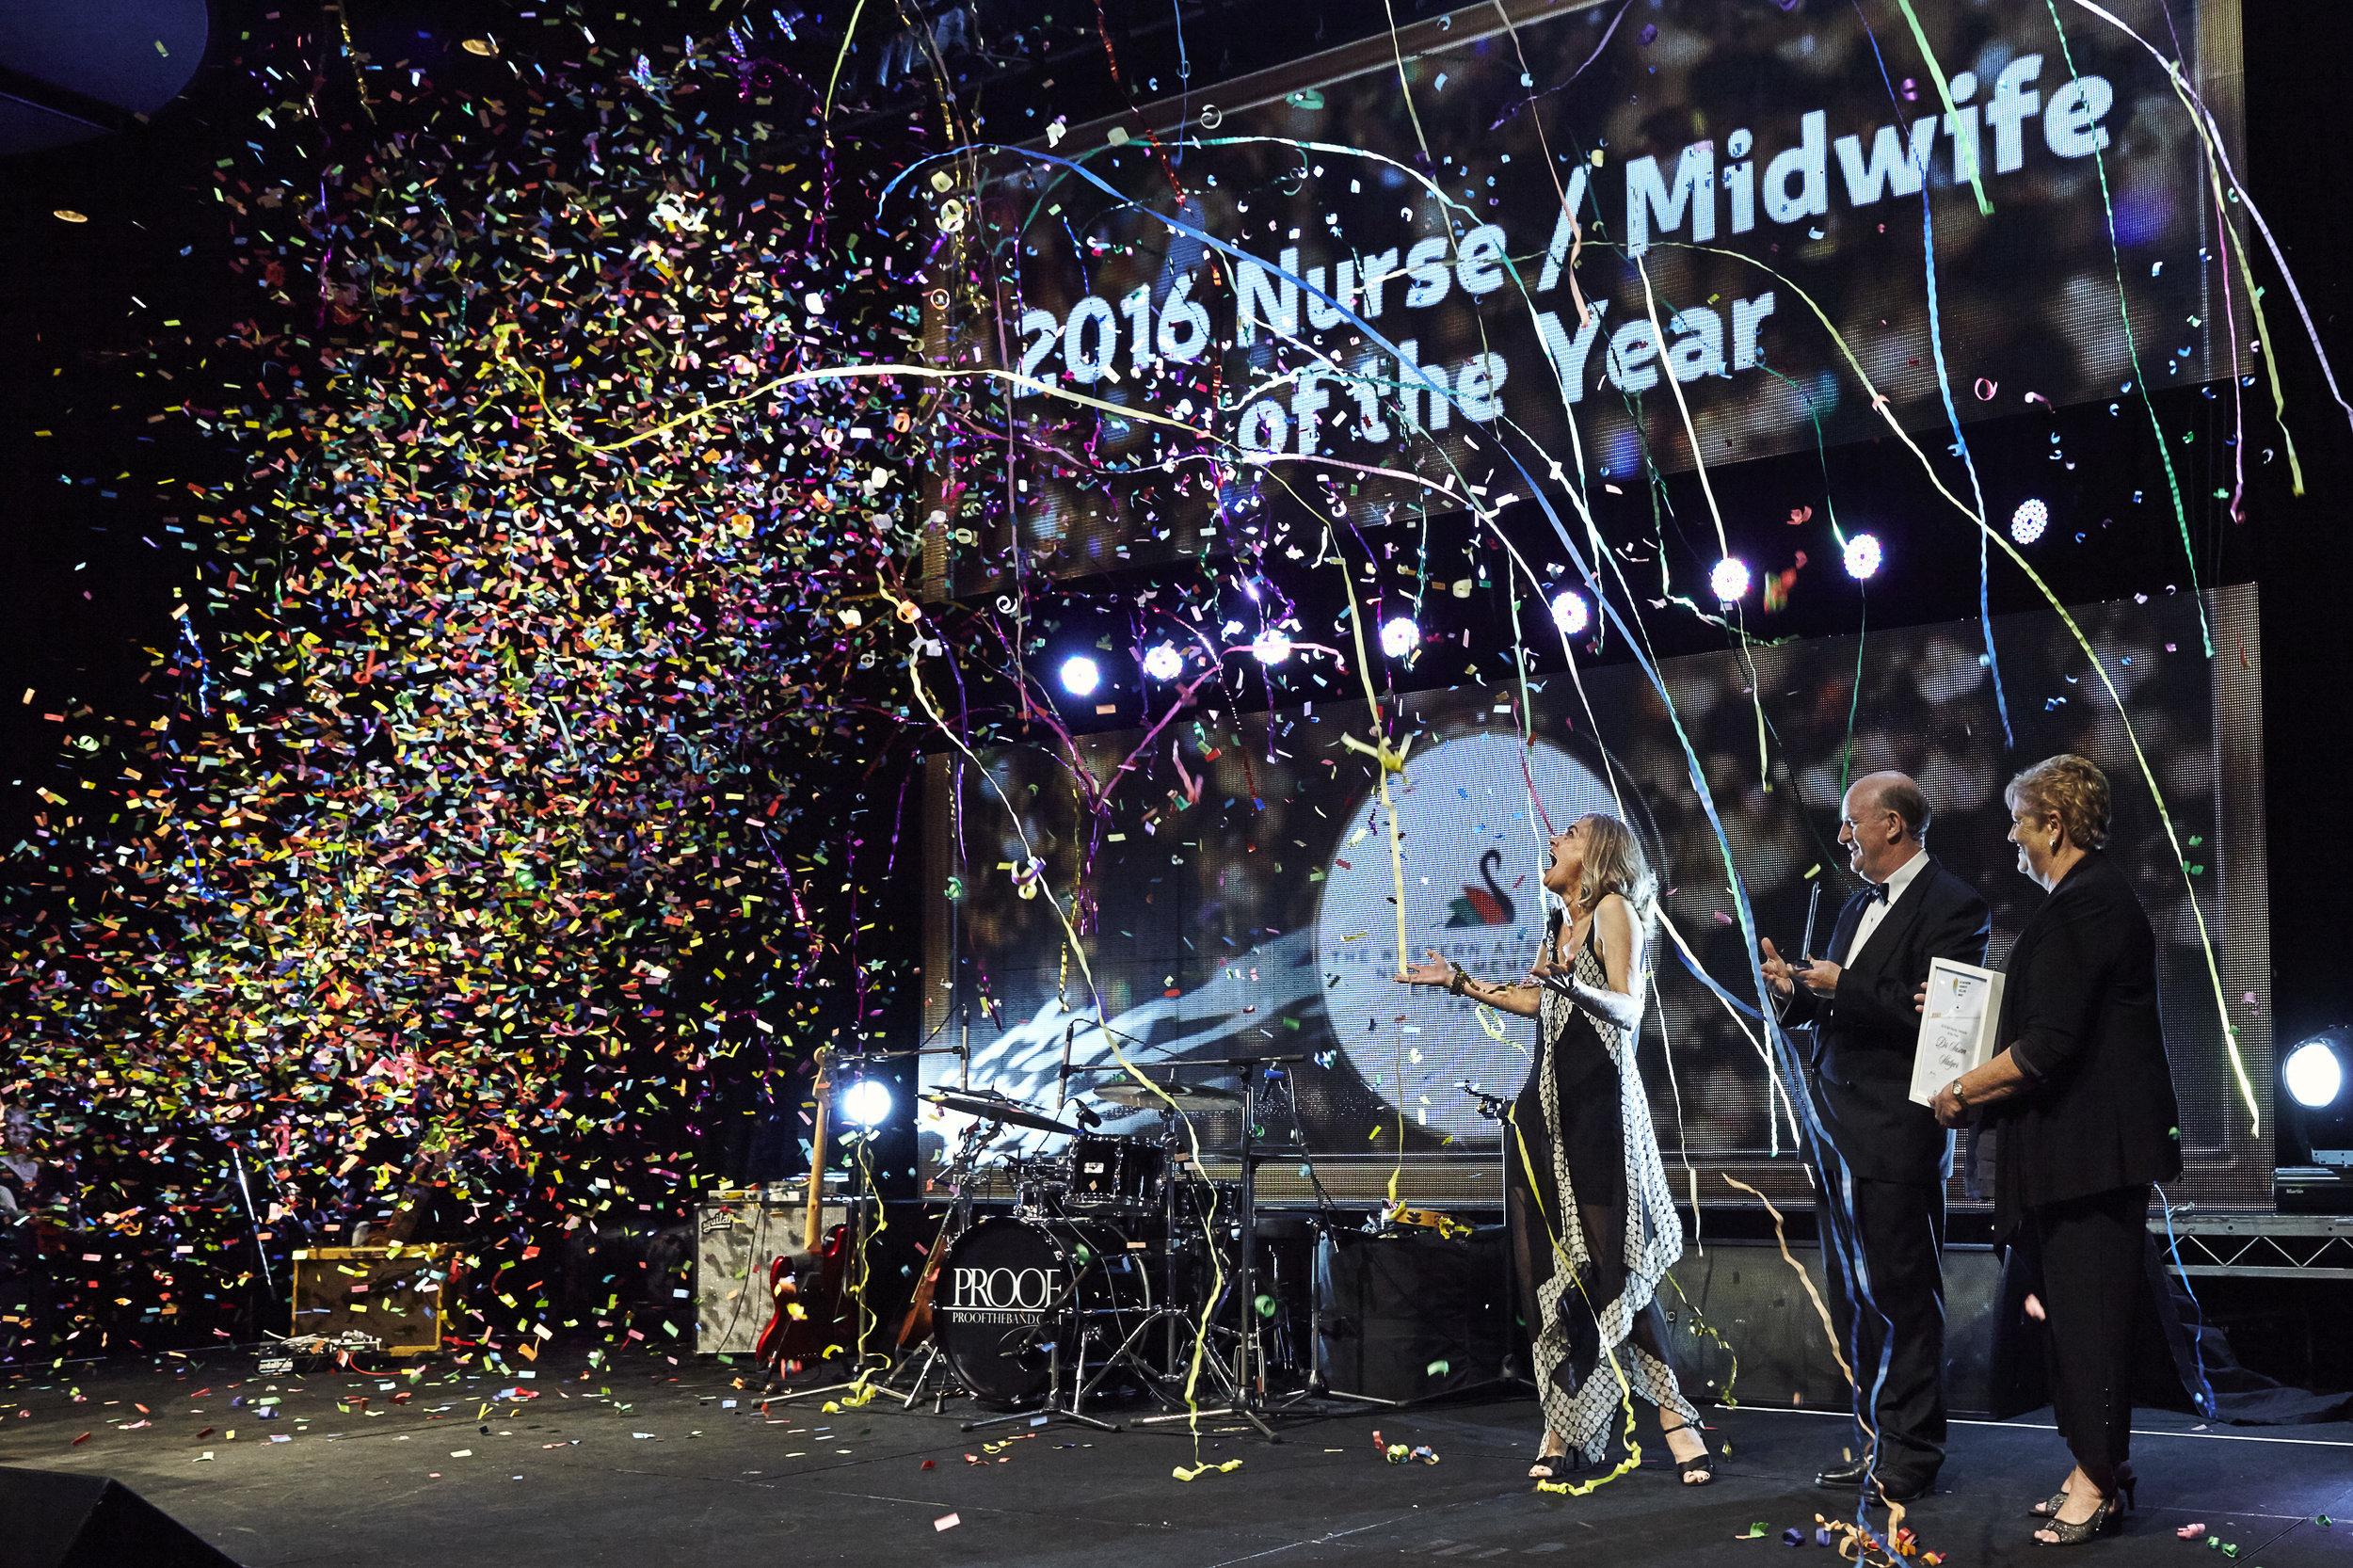 Susan Slatyer, 2016 Nurse/Midwife of the Year